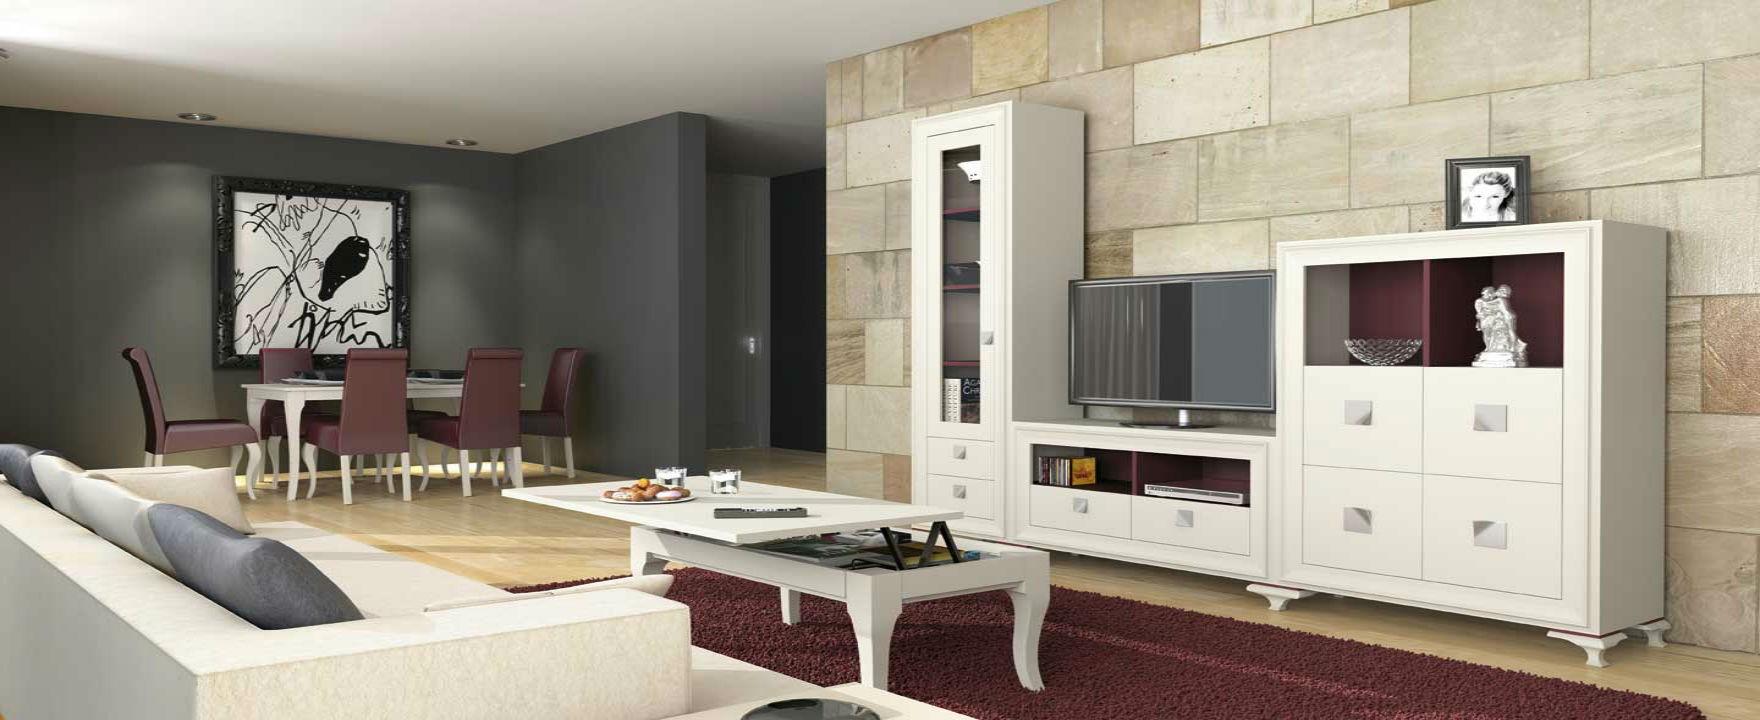 Venta De Muebles En Valencia Idea Creativa Della Casa E Dell  # Muebles Cervera